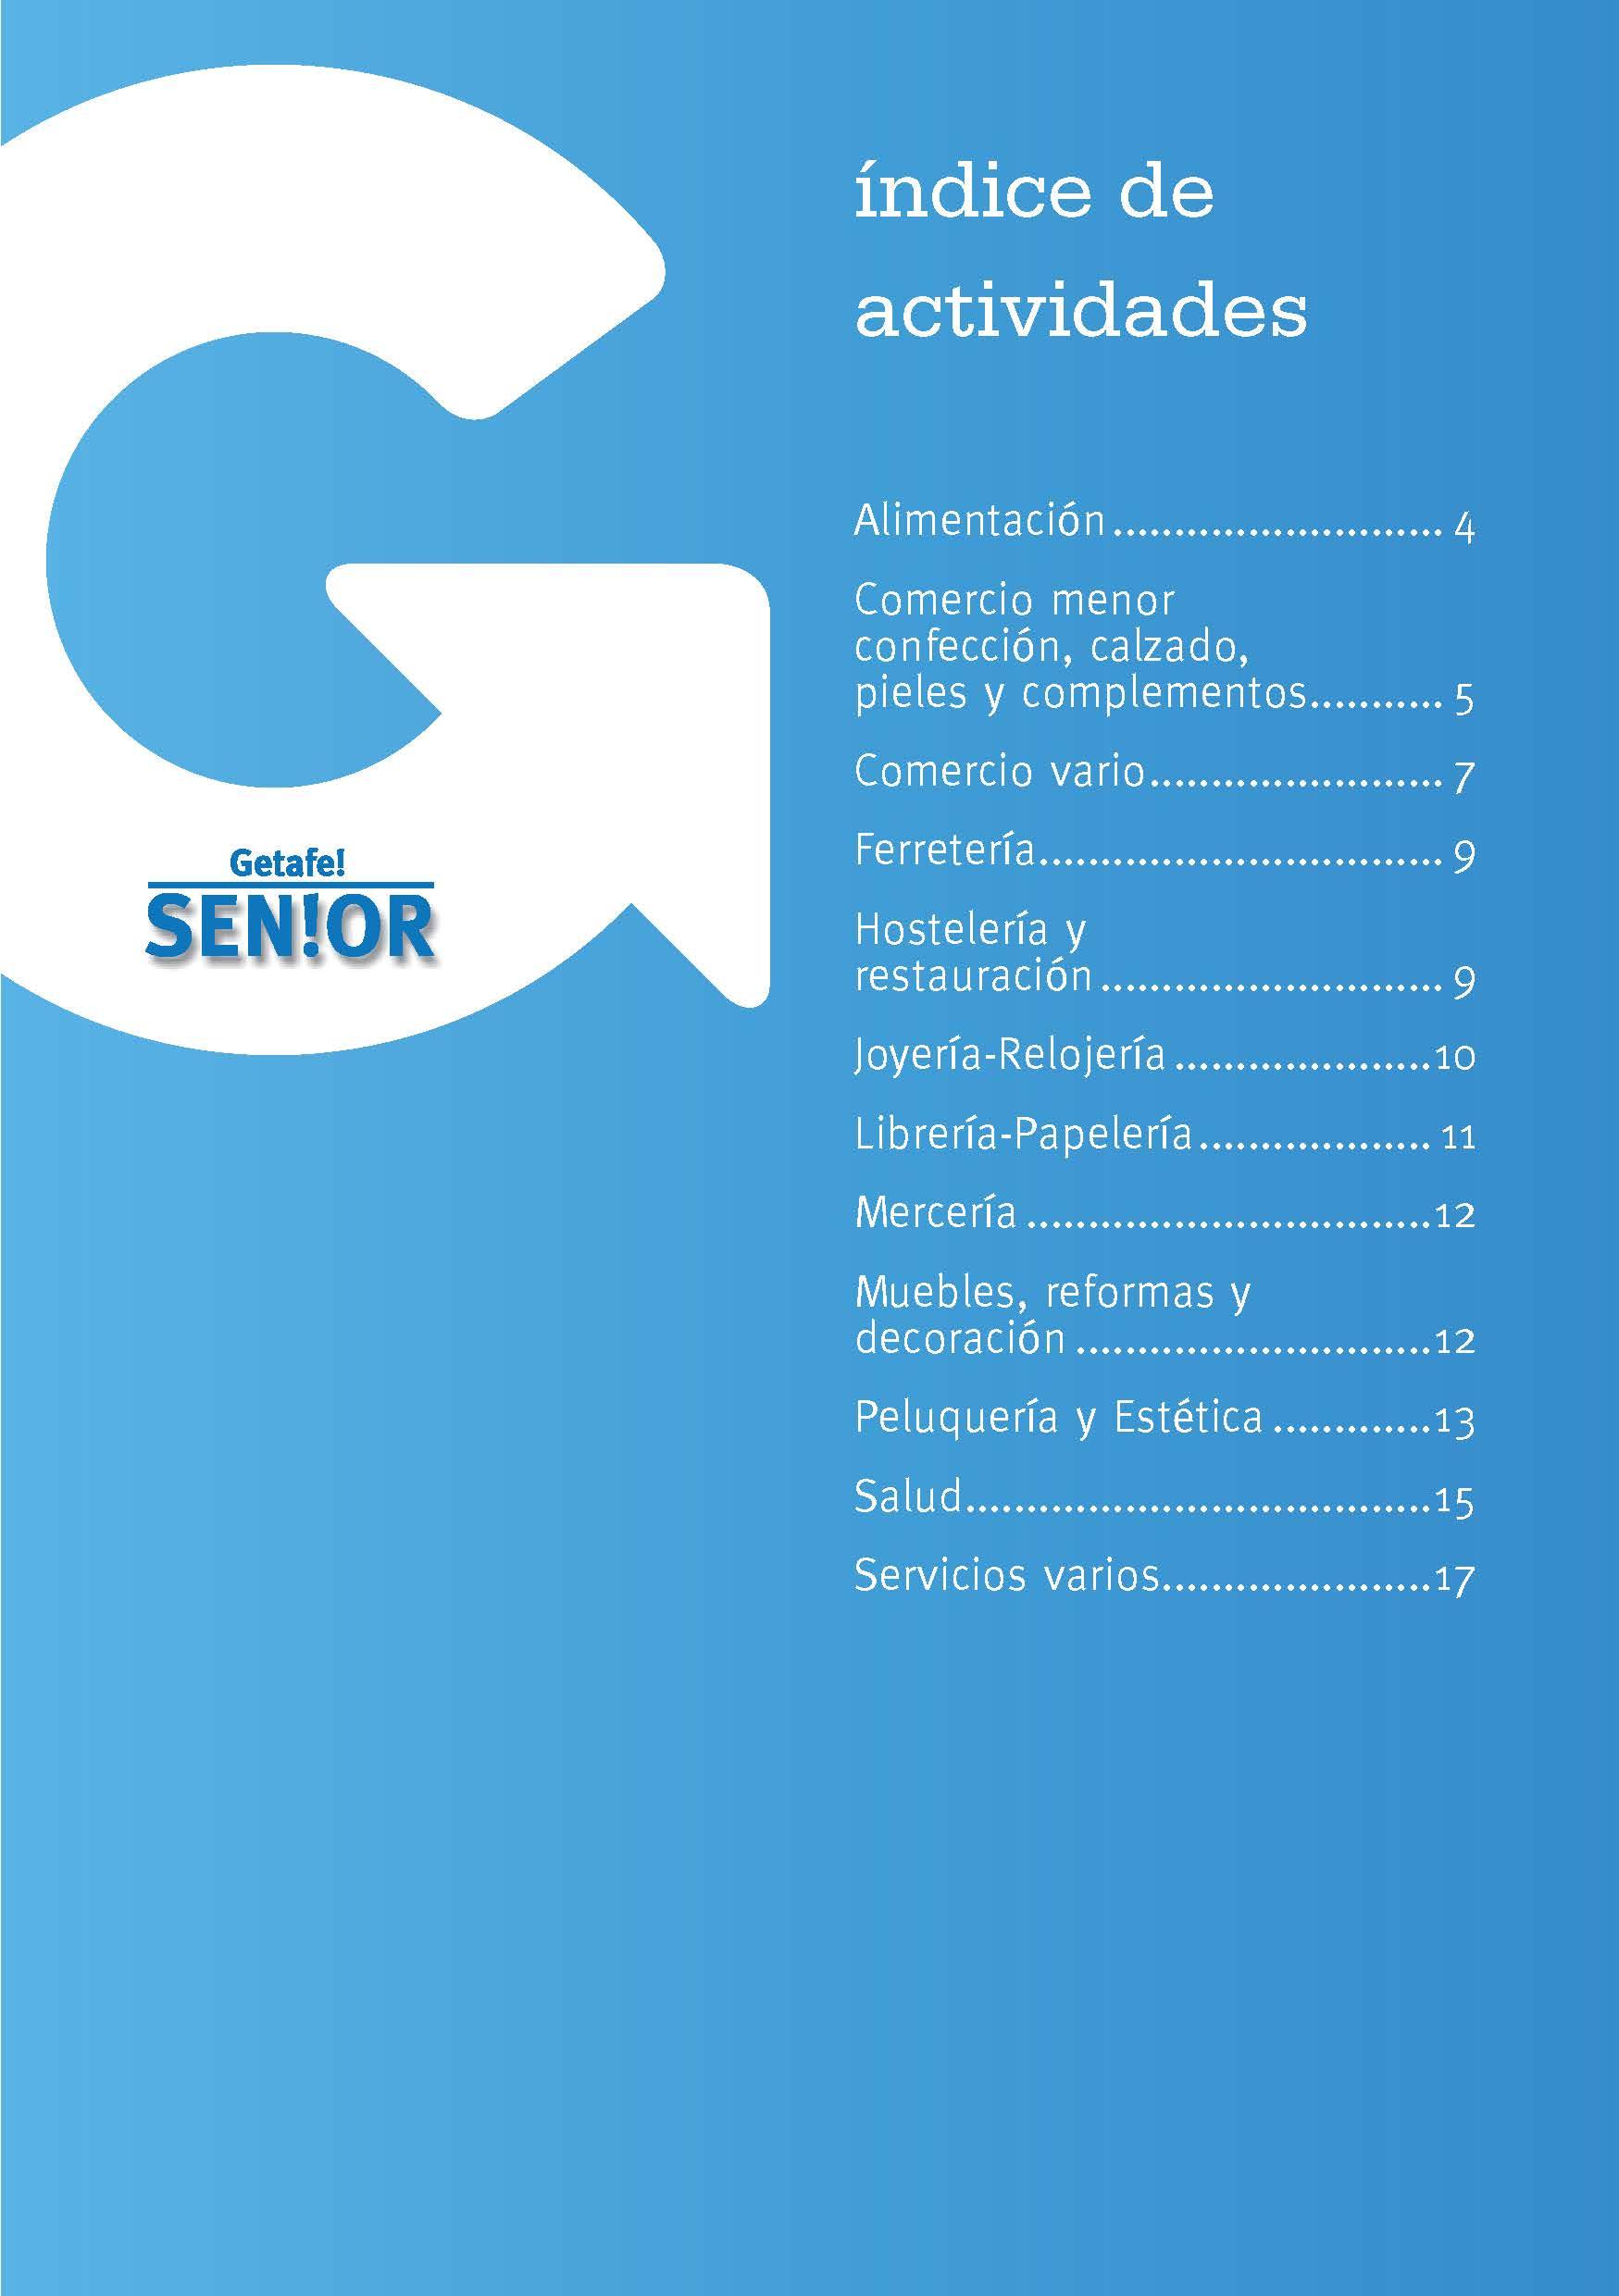 Guia GETAFE SENIOR (3).jpg